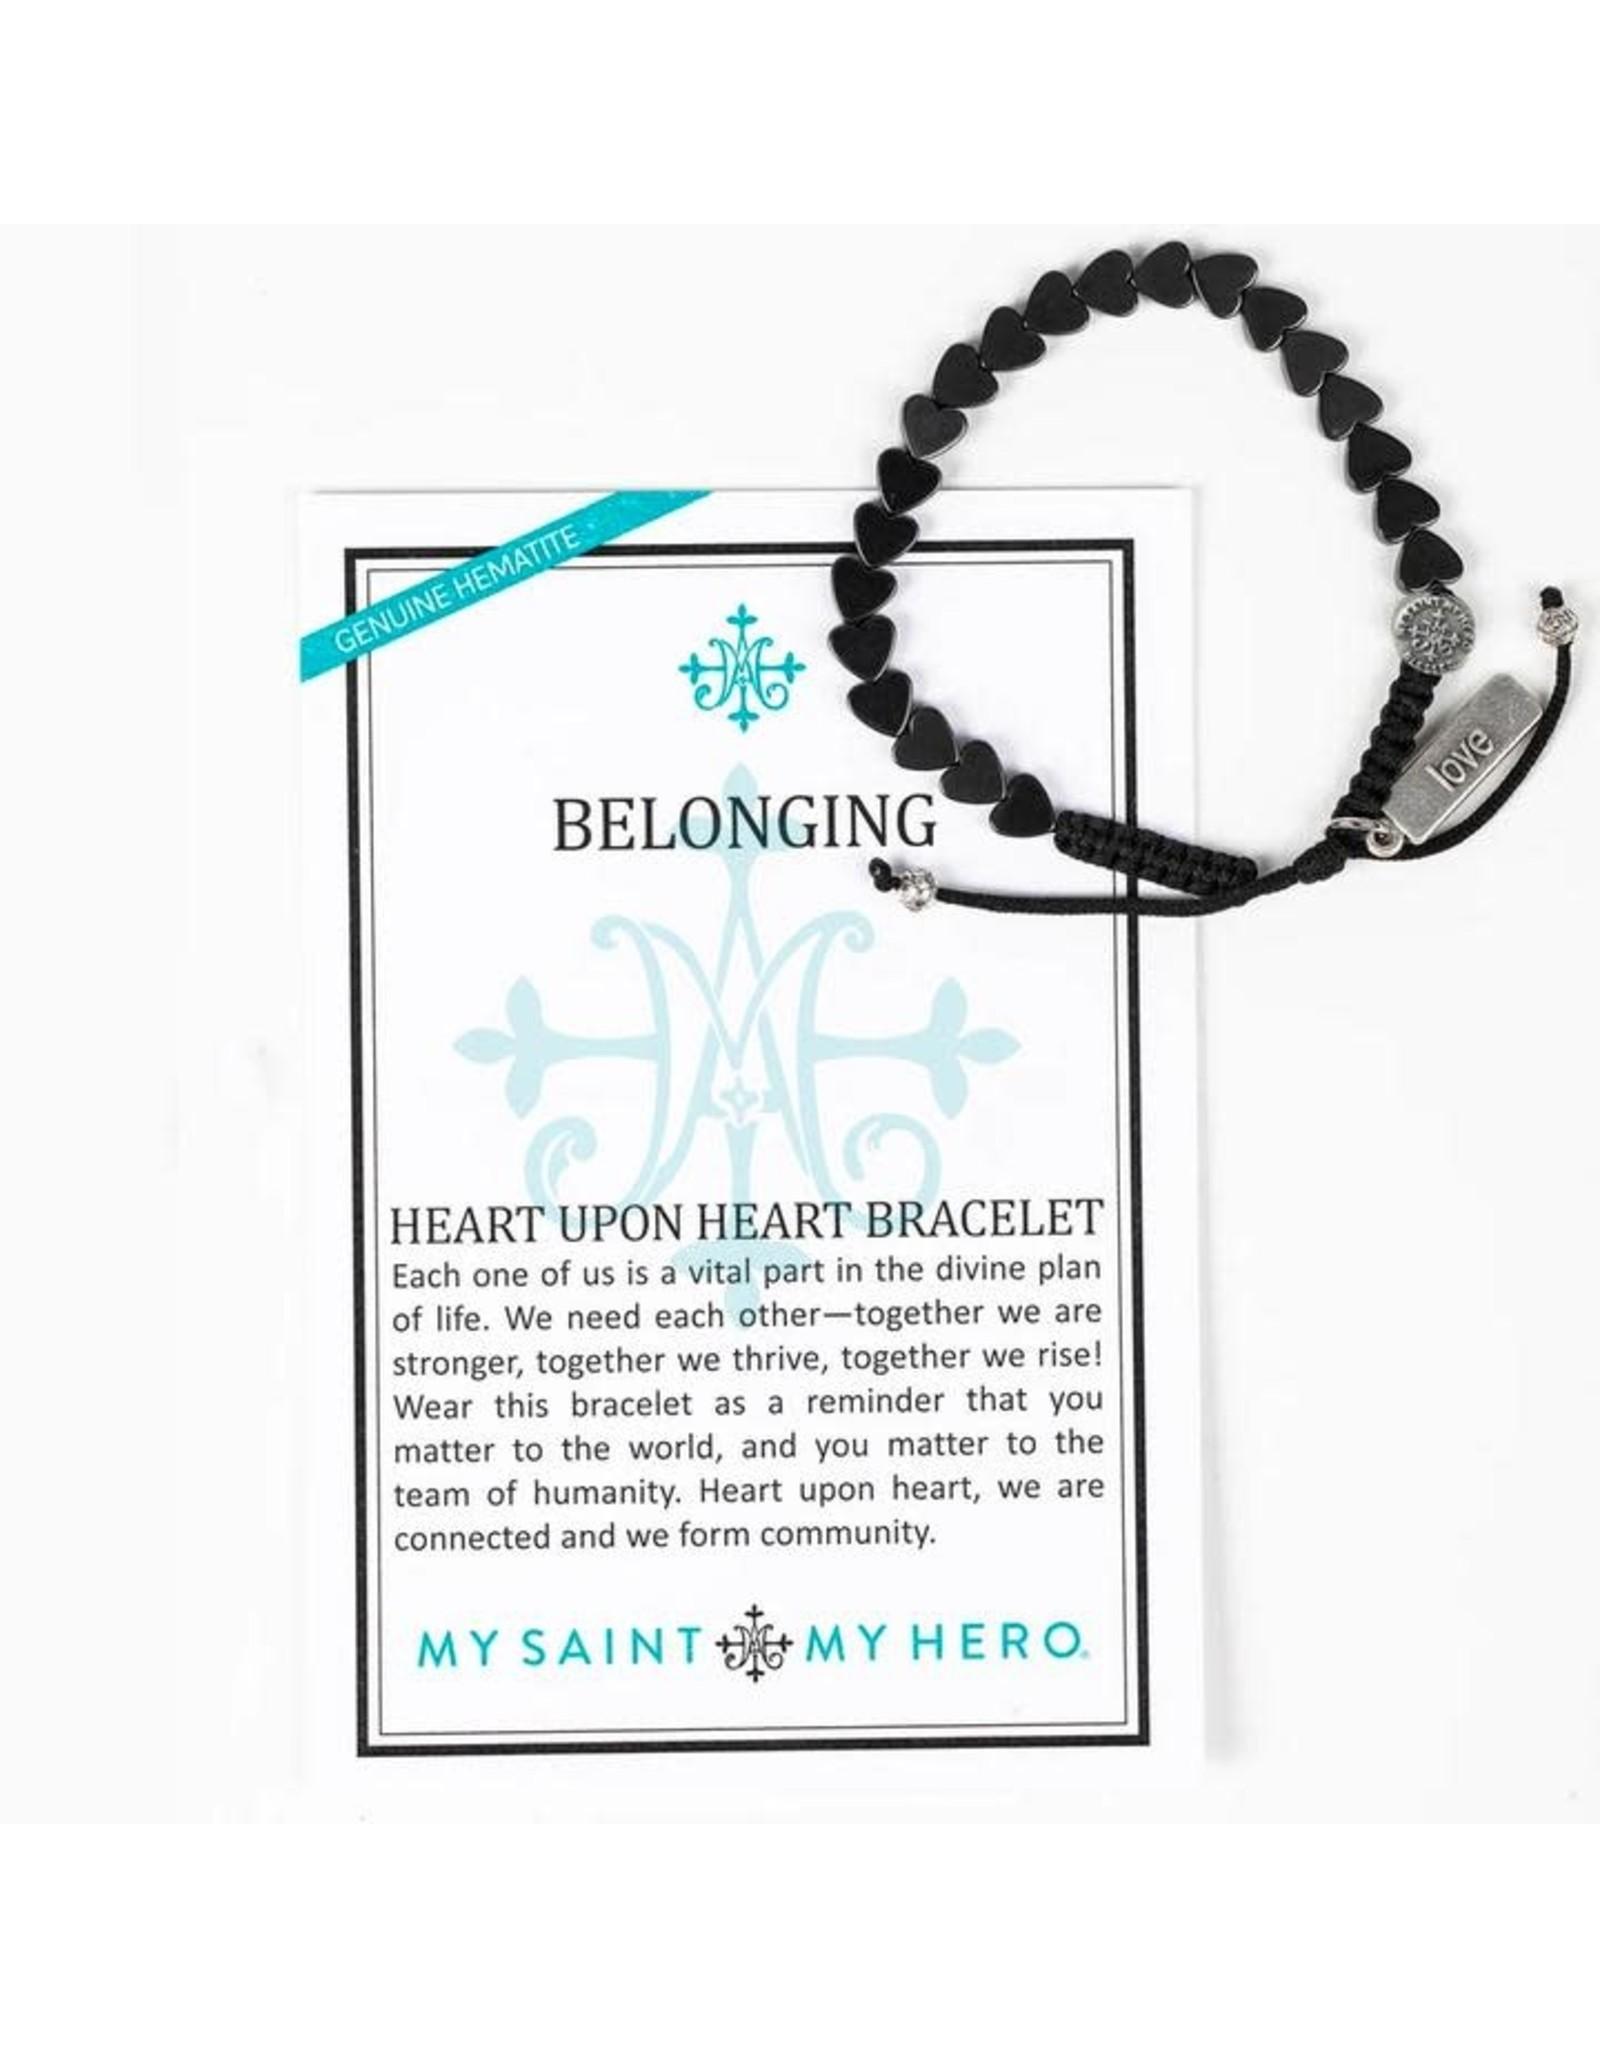 MSMH Belonging Heart Upon Heart Bracelet